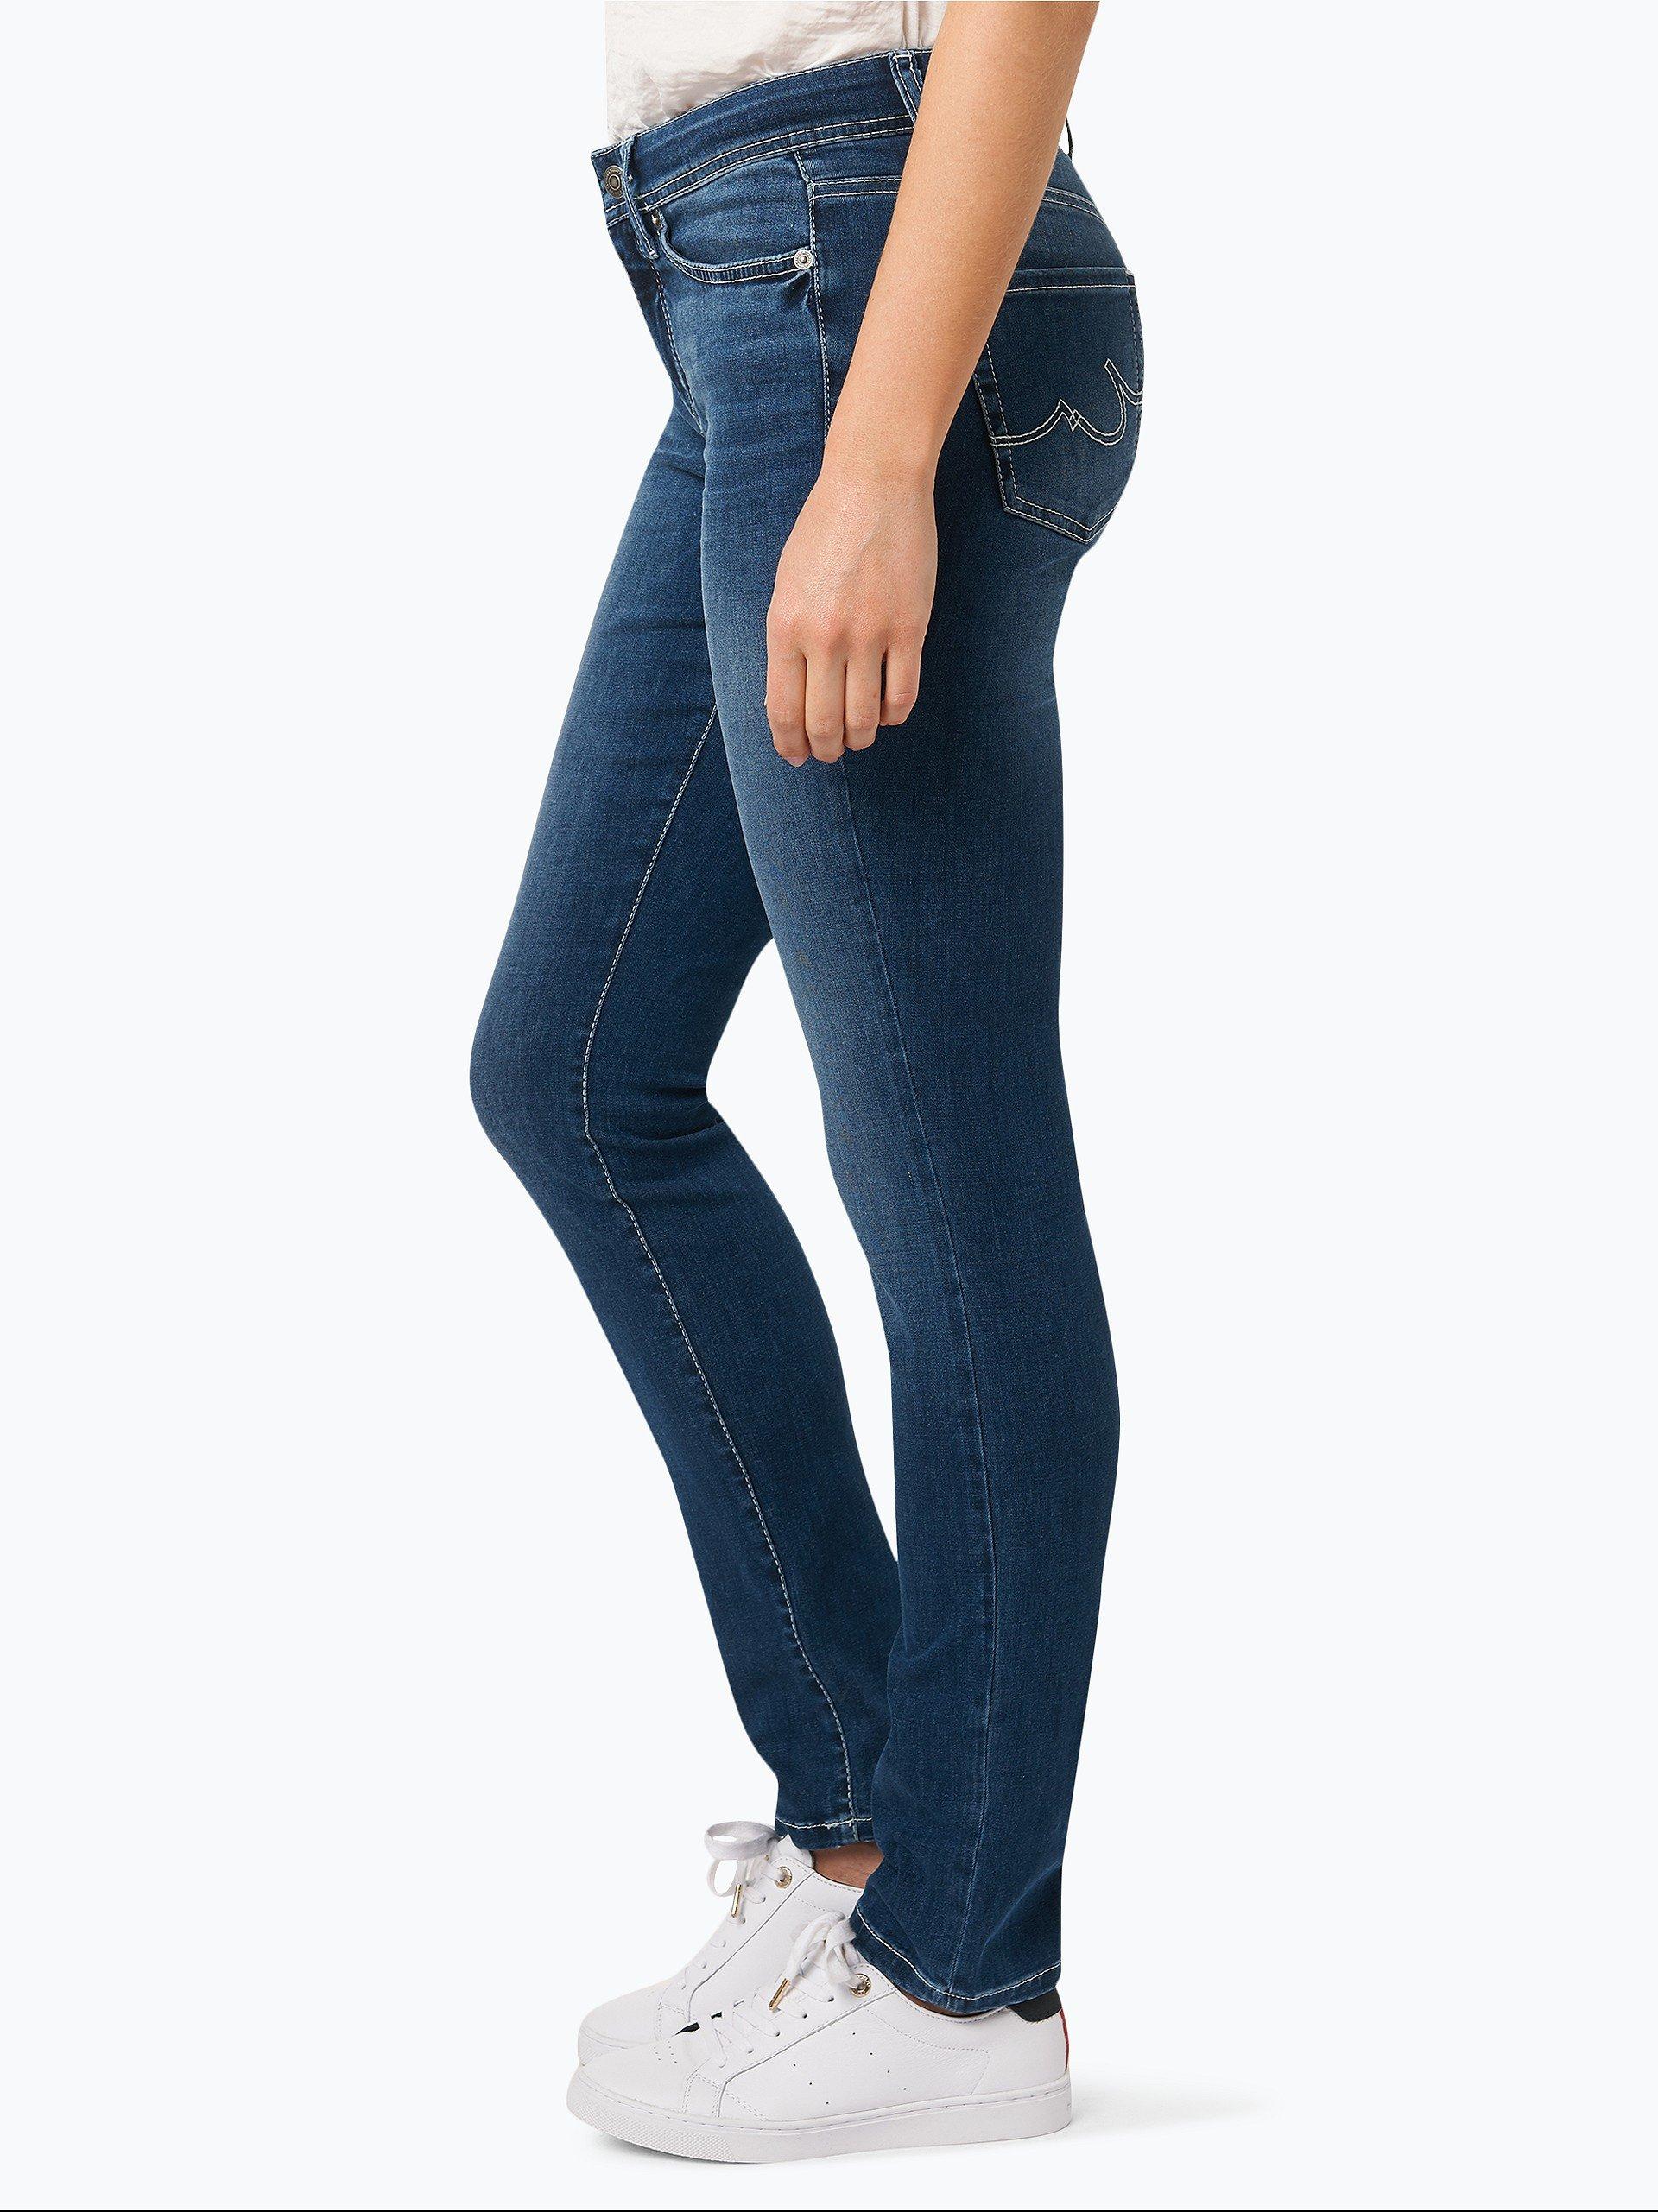 cambio damen jeans parla blue stone uni online kaufen peek und cloppenburg de. Black Bedroom Furniture Sets. Home Design Ideas